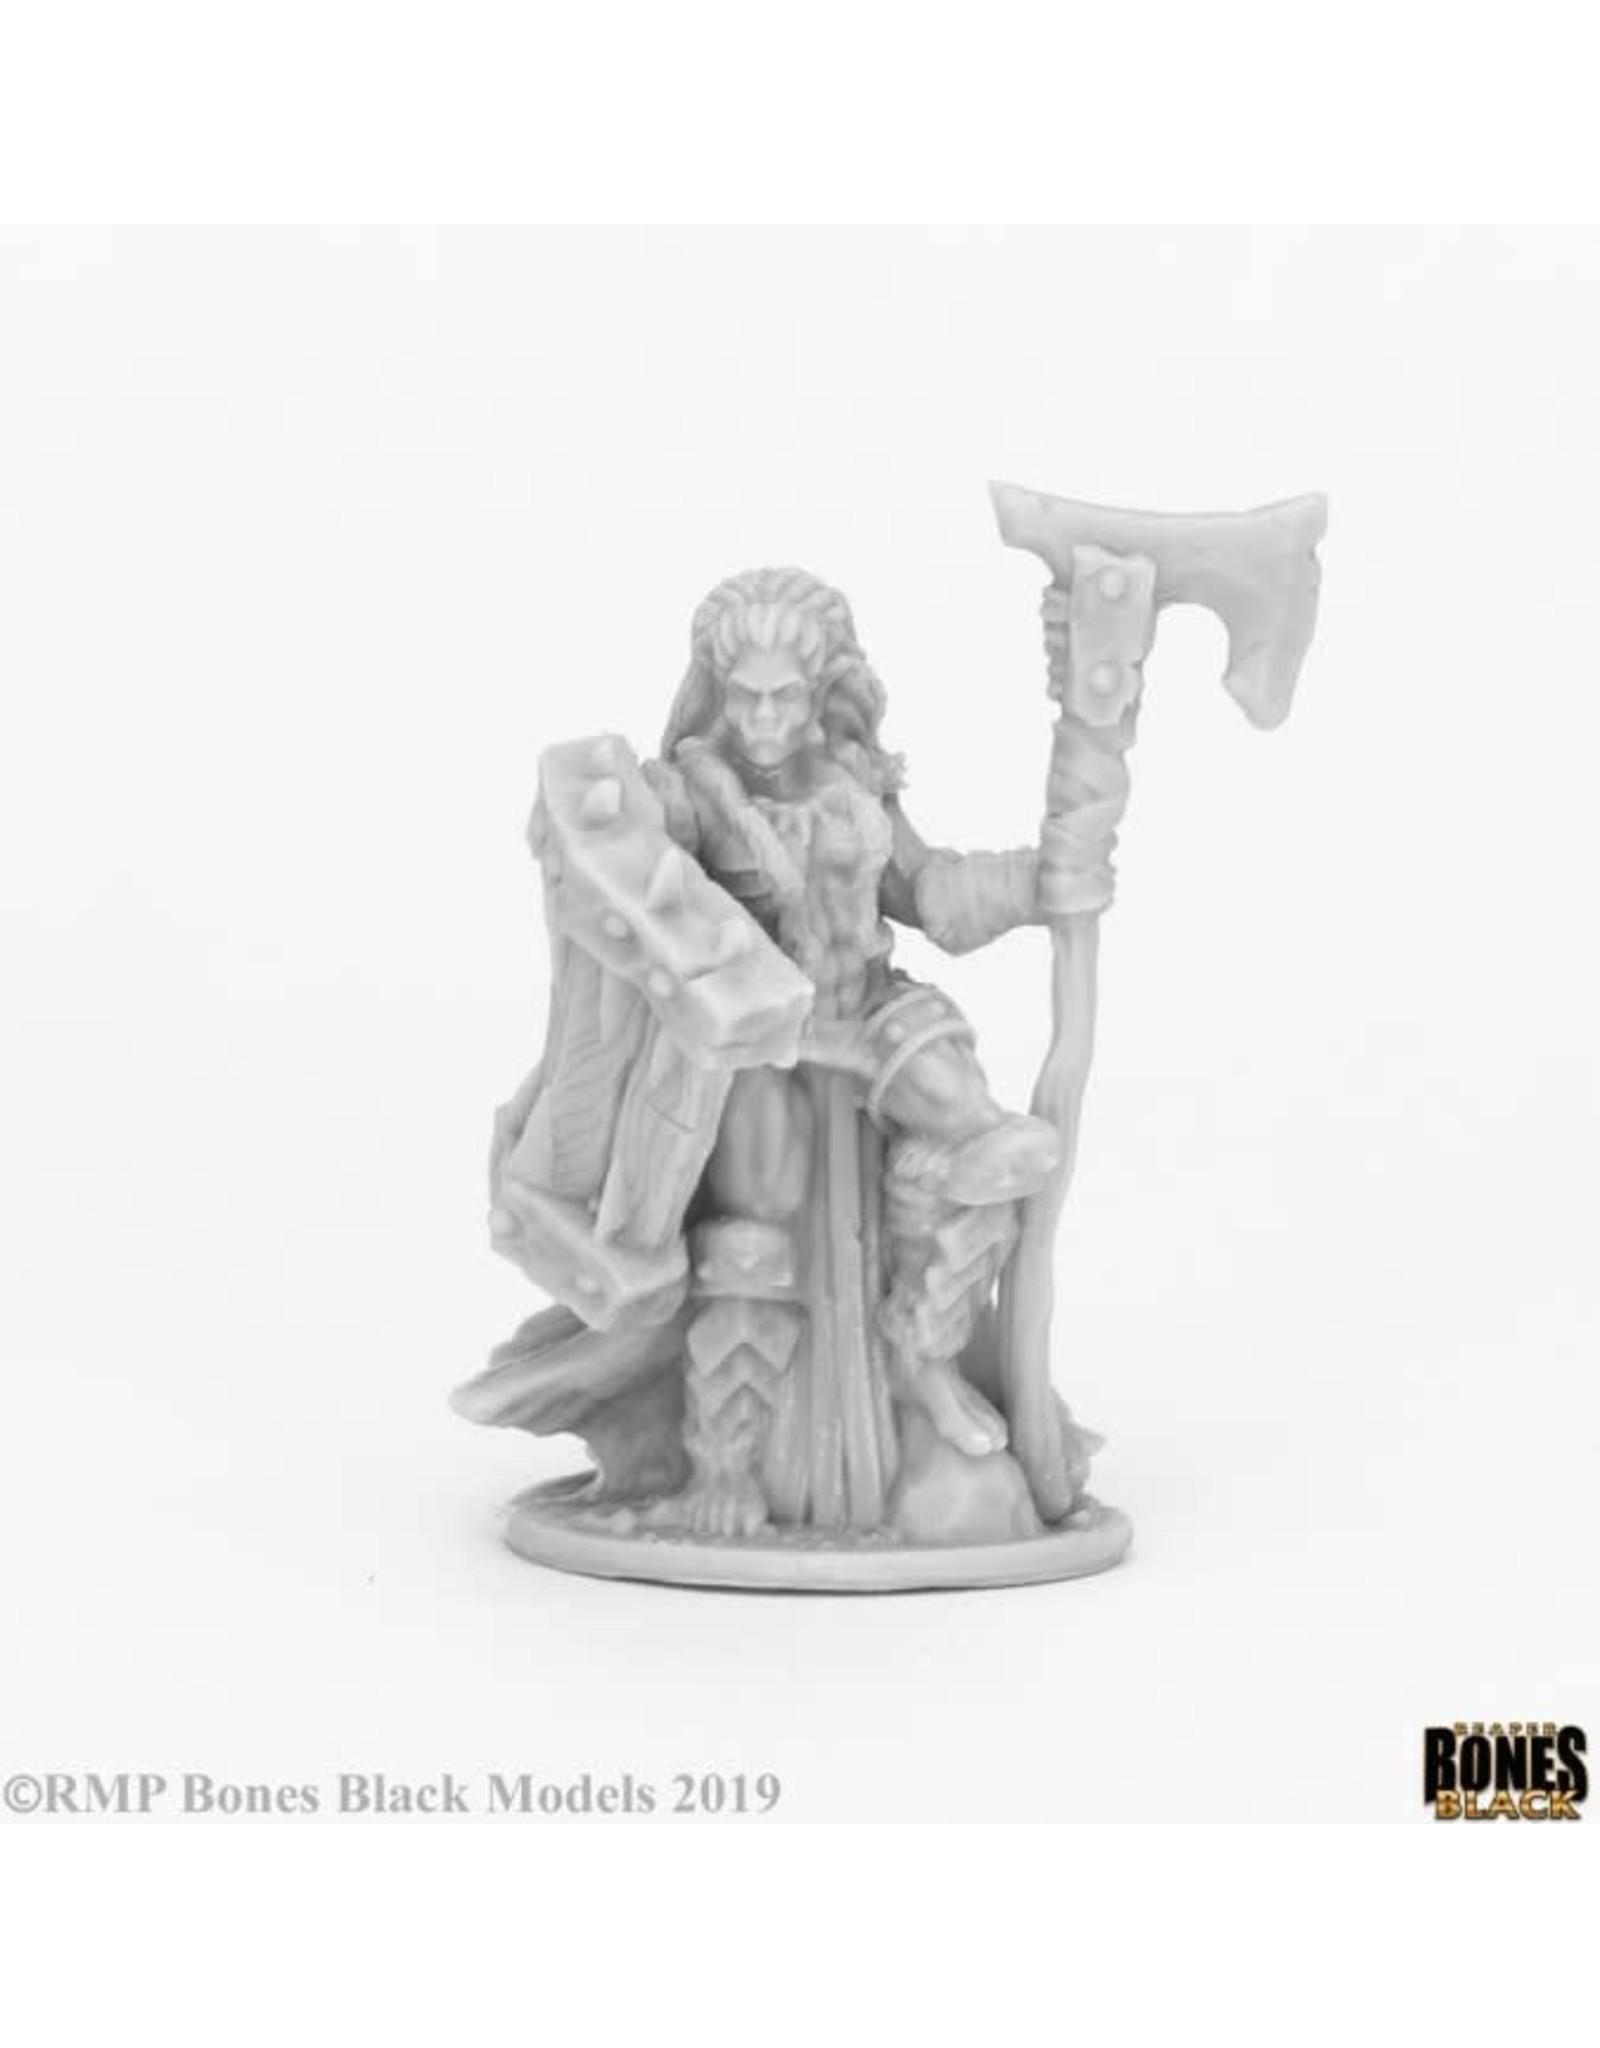 Reaper Reaper: Bones Black: Jade Fire Chieftain